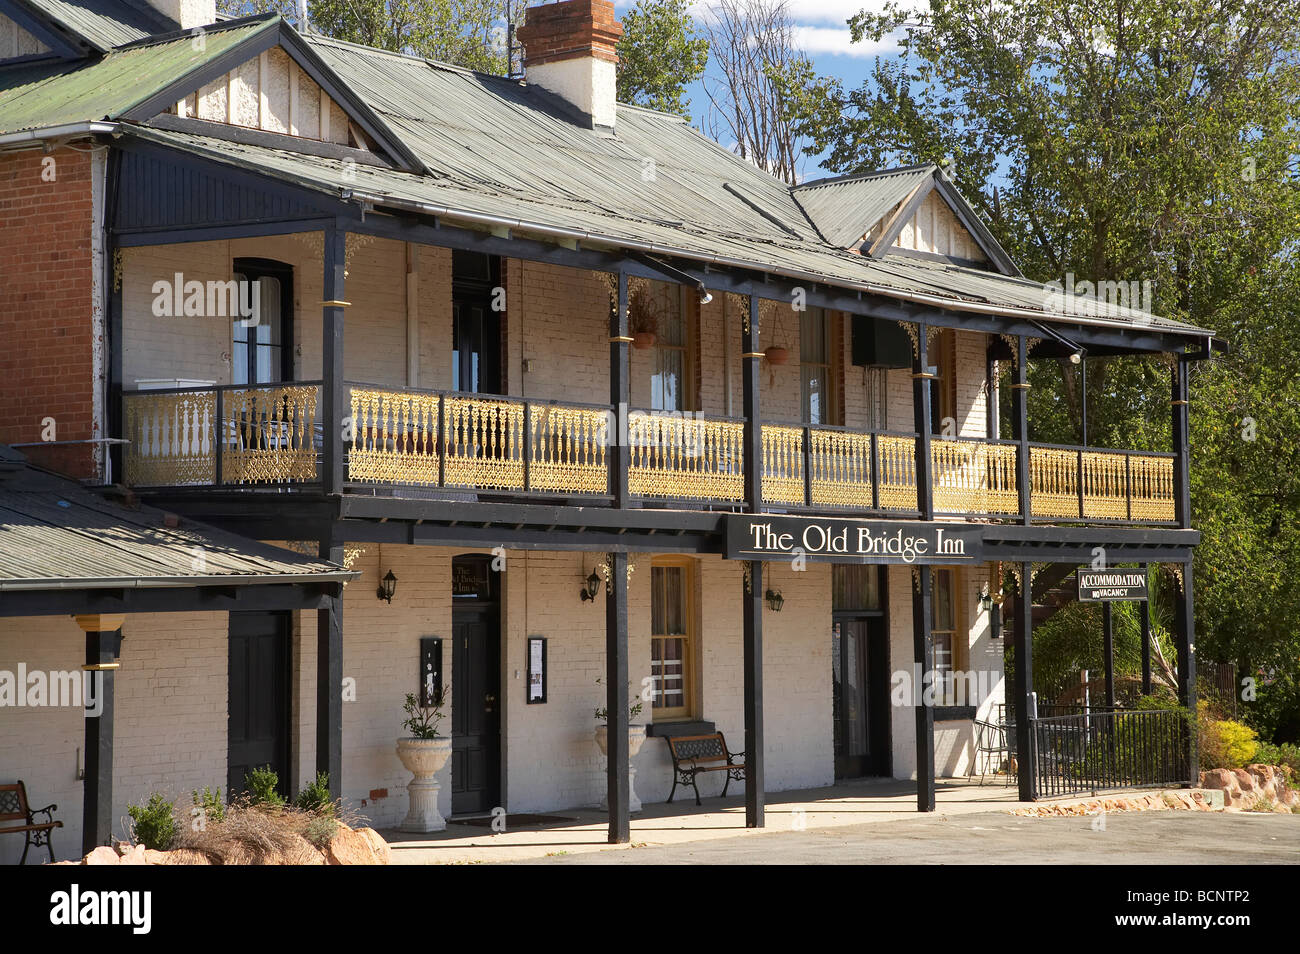 The Old Bridge Inn 1850s Gundagai Southern New South Wales Australia - Stock Image